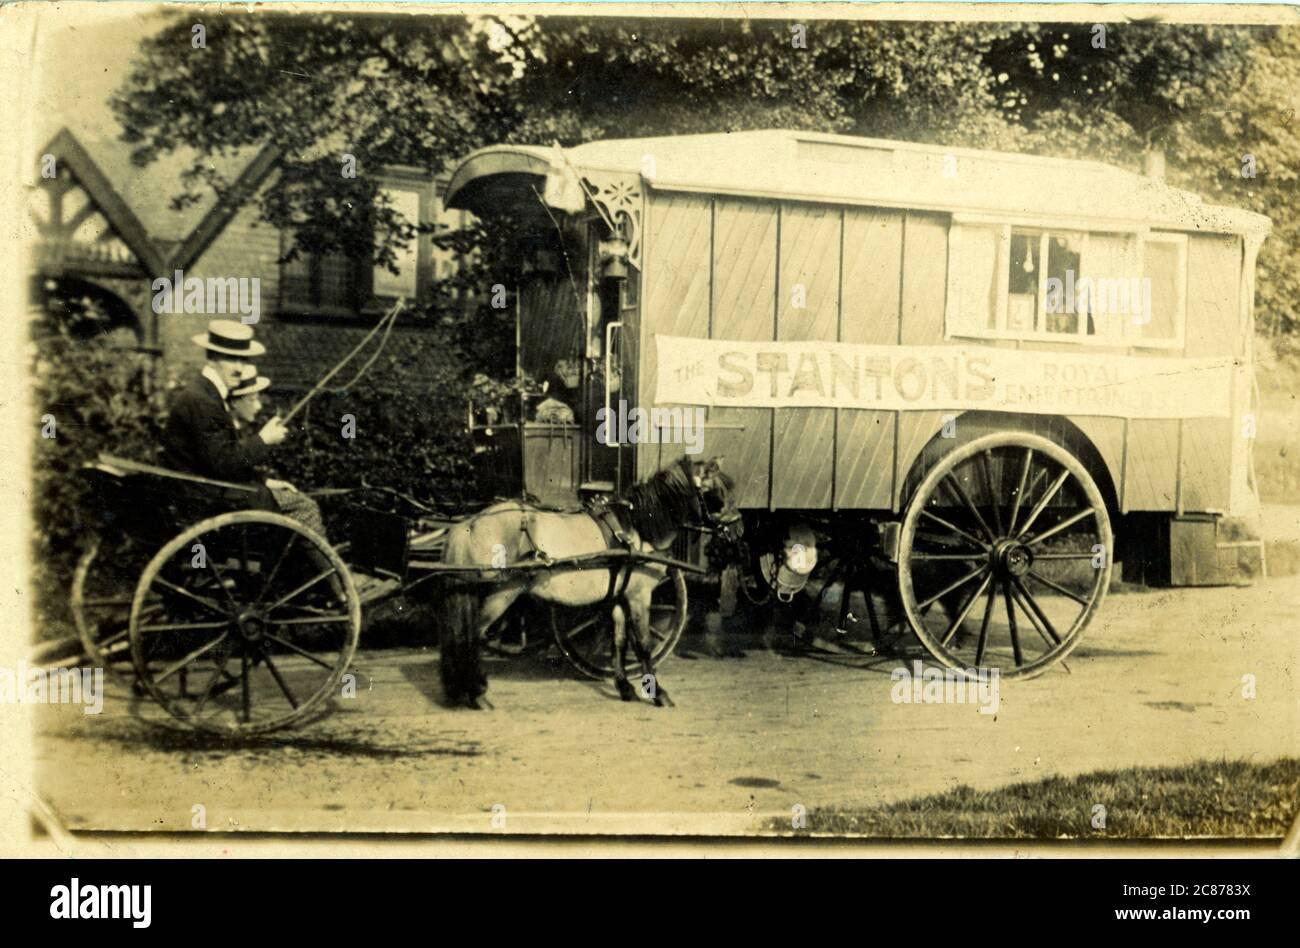 Vintage Caravan (Stanton's Royal Entertainers), Derby, Derbyshire, England. Stockfoto